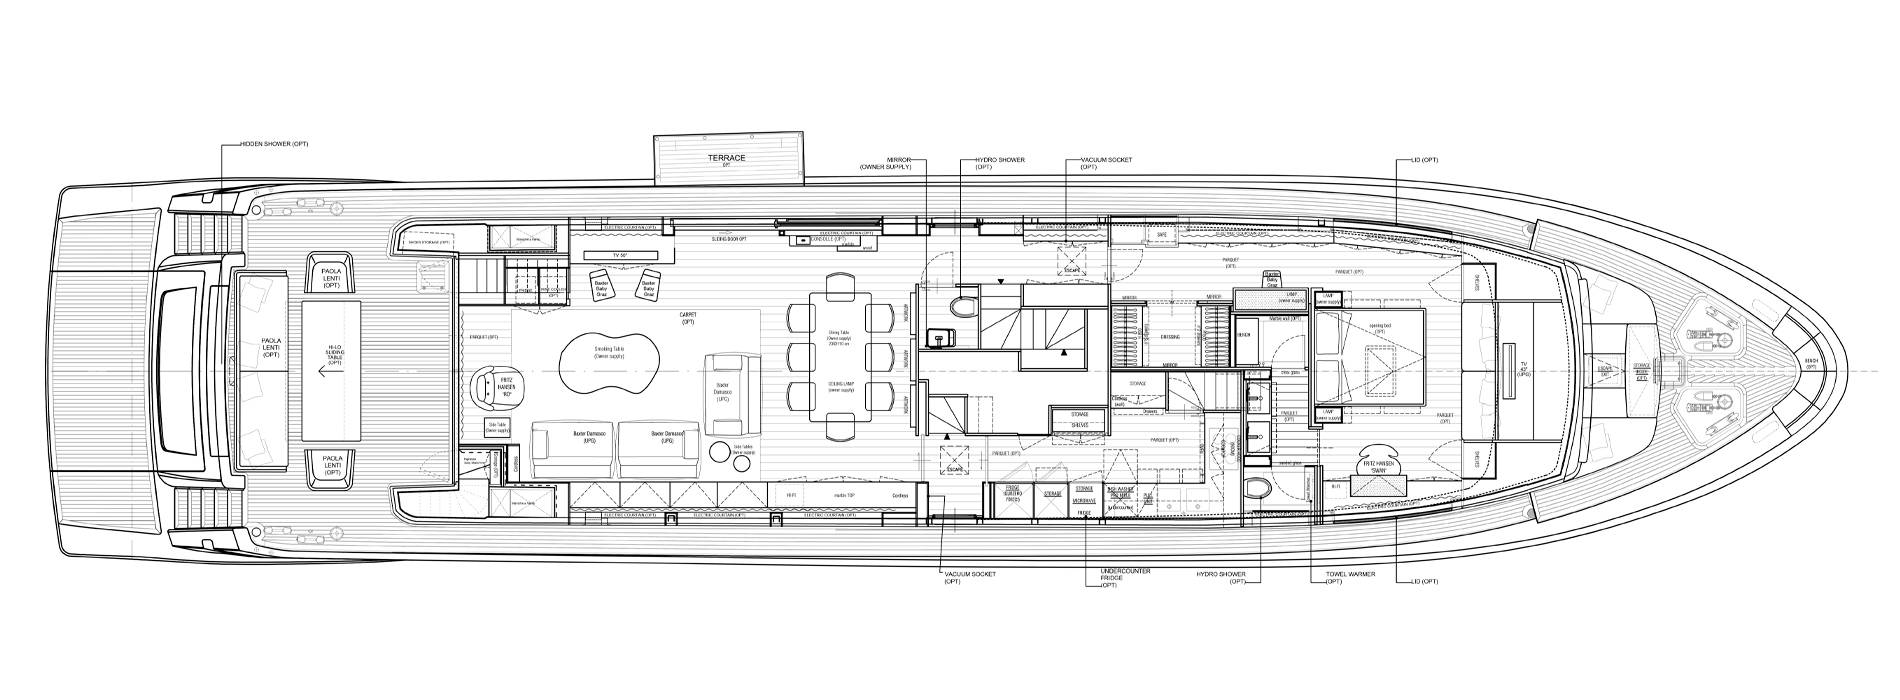 Sanlorenzo Yachts SL106-625 Hauptdeck